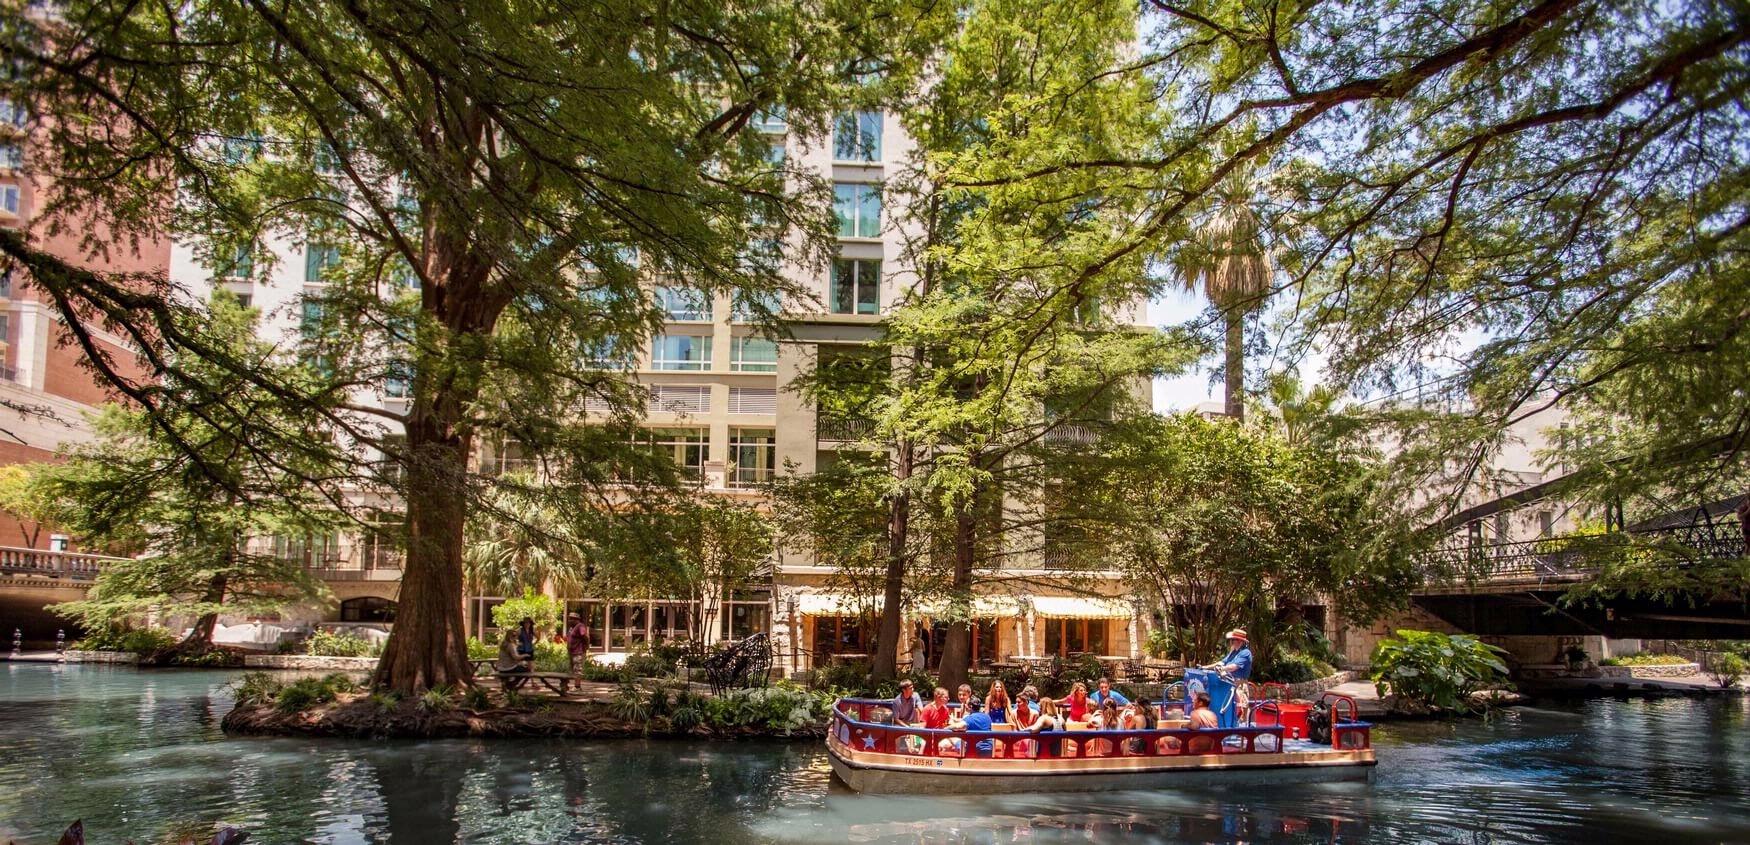 Downtown San Antonio Hotel | Hotel Contessa - Map Of Hotels Near Riverwalk In San Antonio Texas